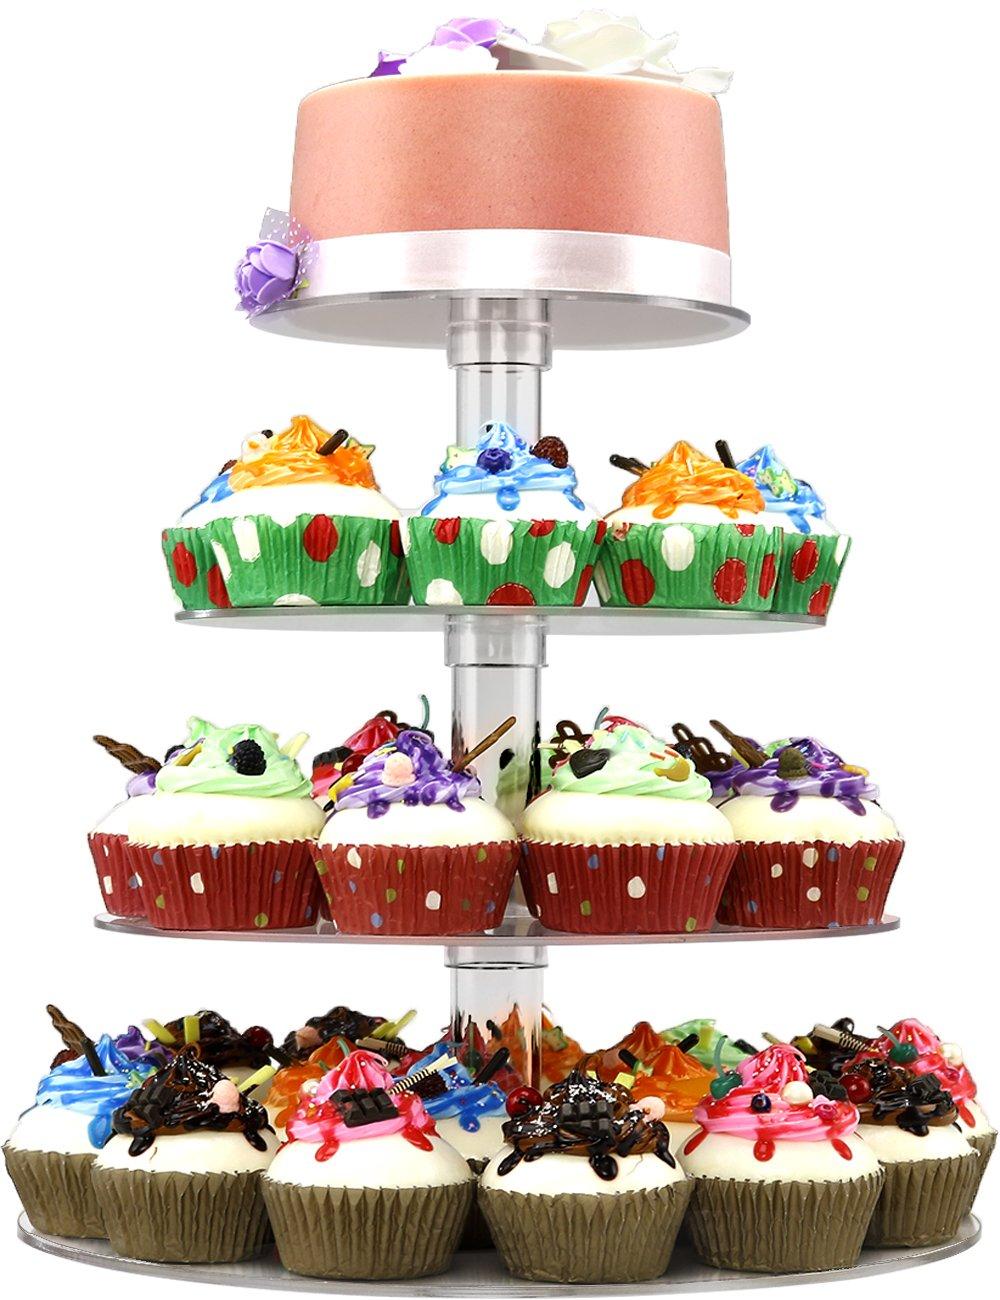 Cheap Wedding Cupcake Display Ideas Find Wedding Cupcake Display